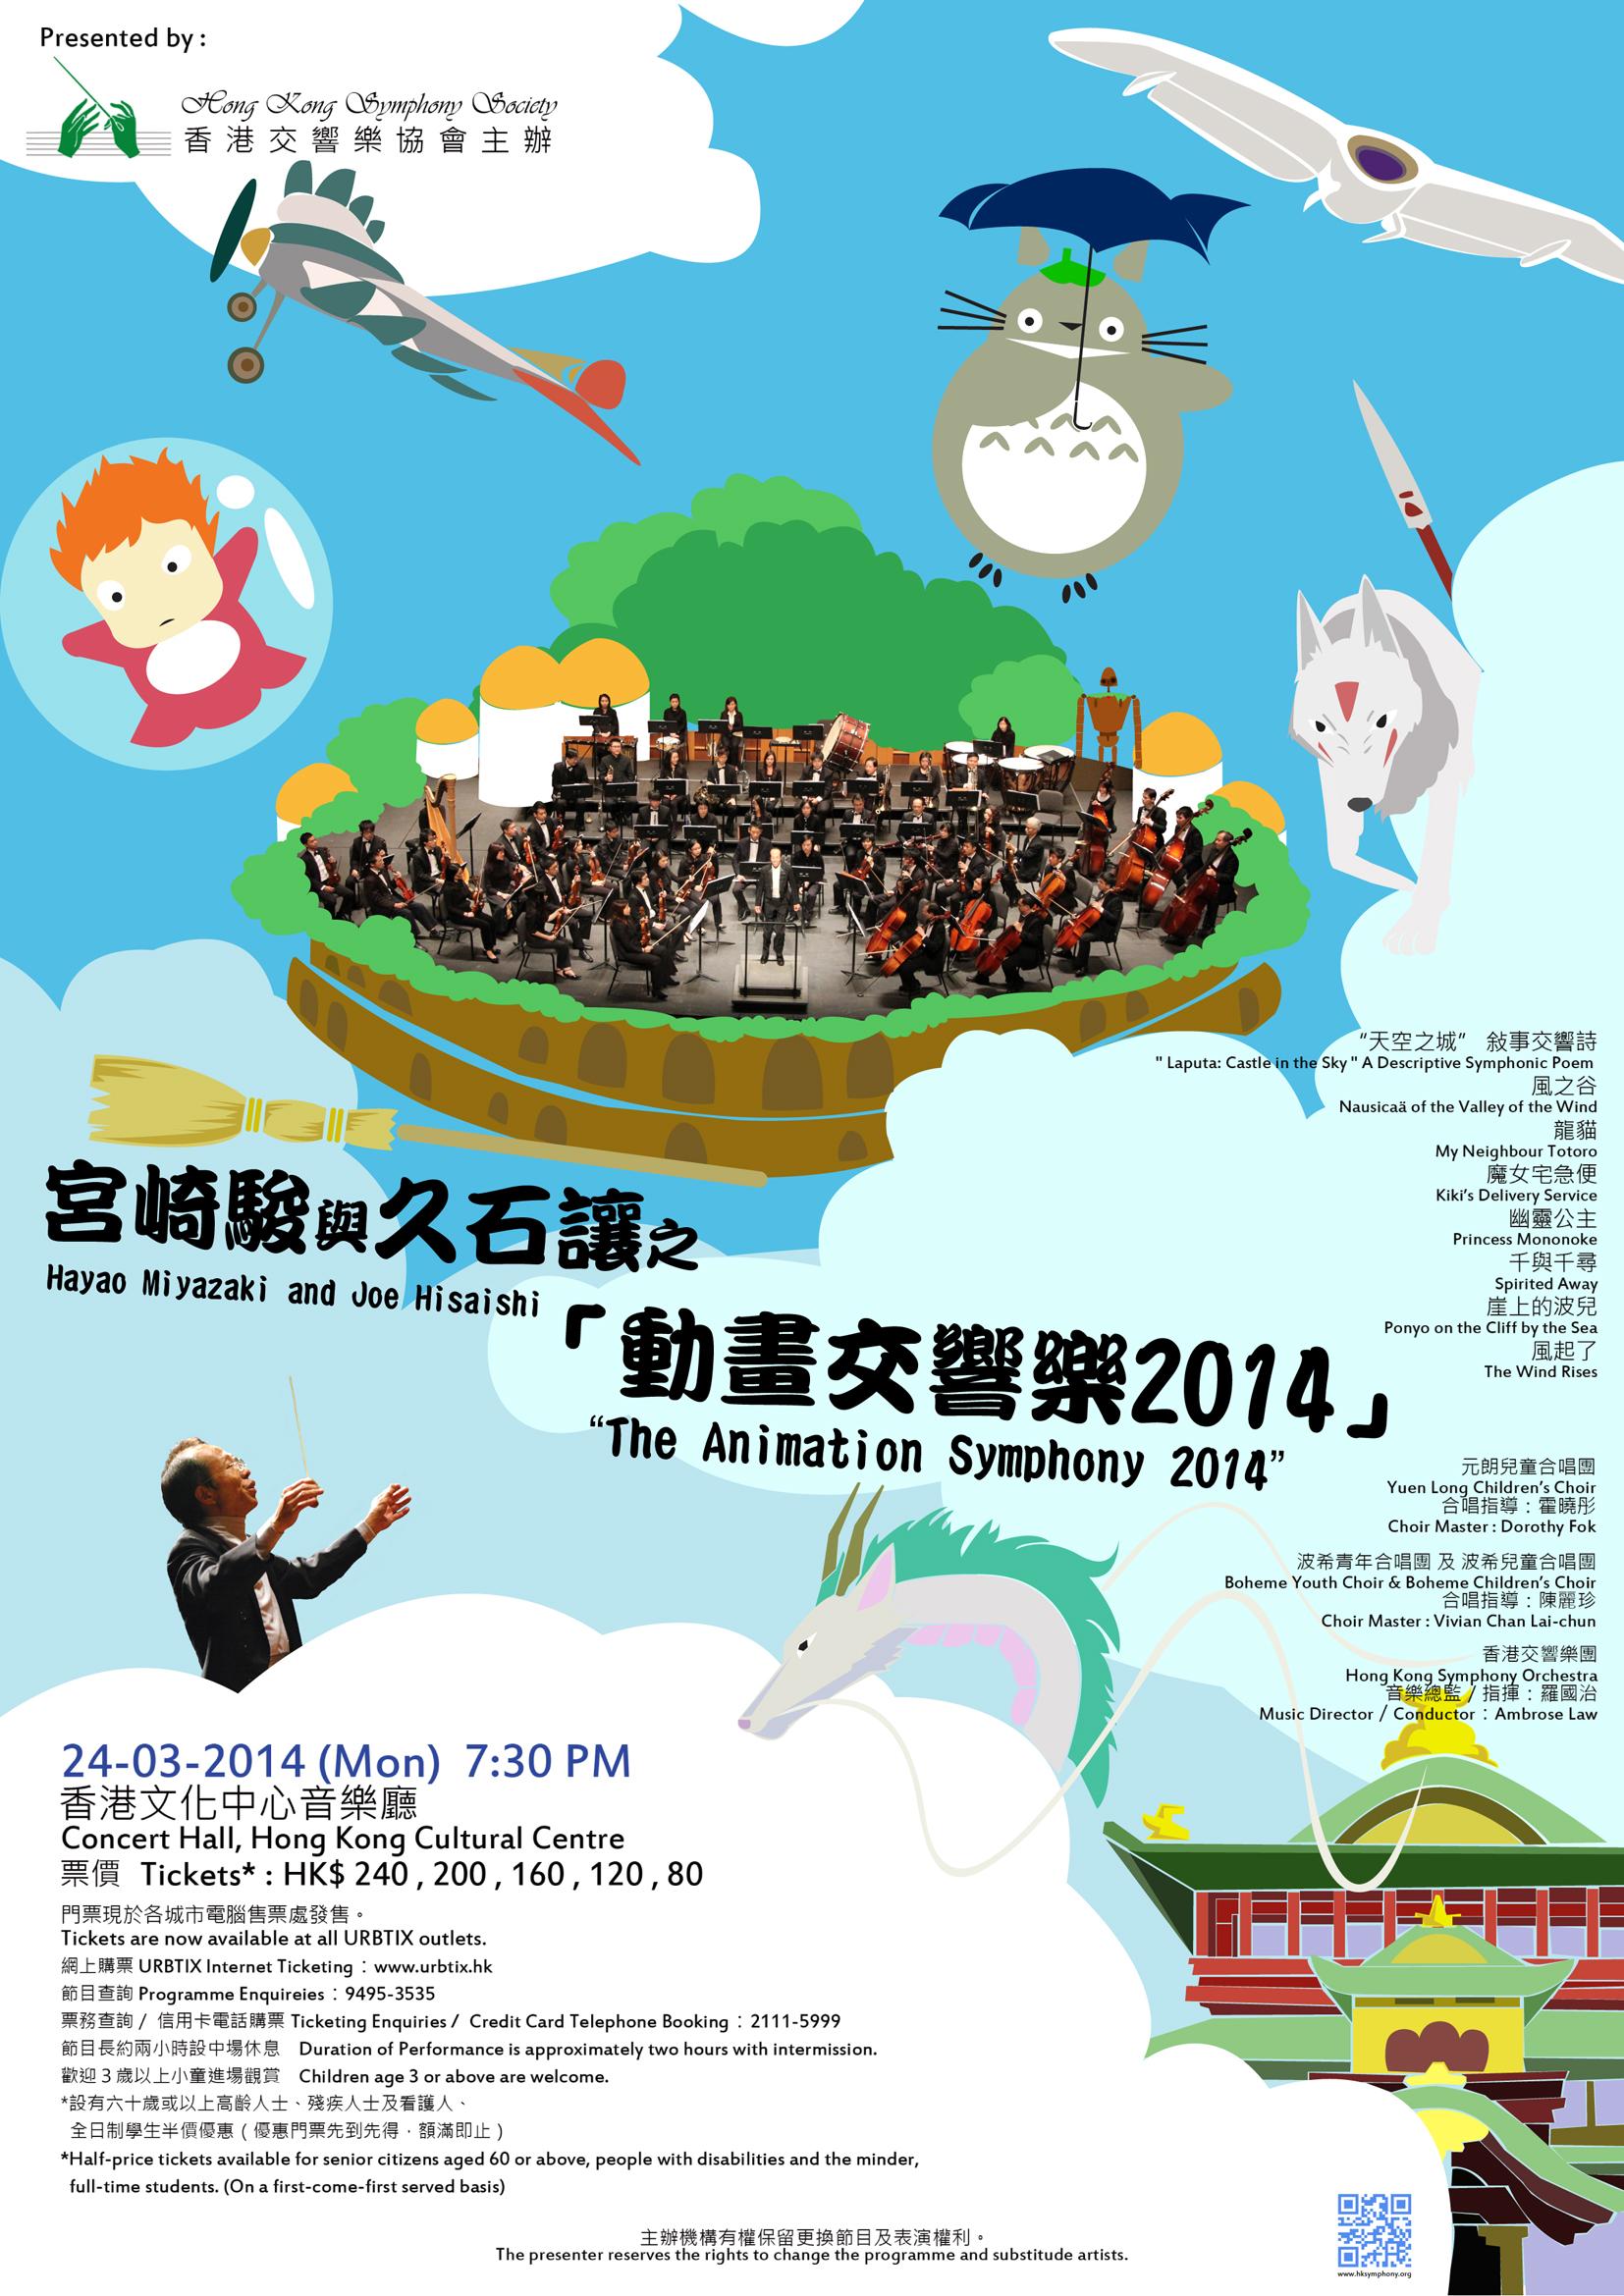 HKSO - Animation Concert 2014